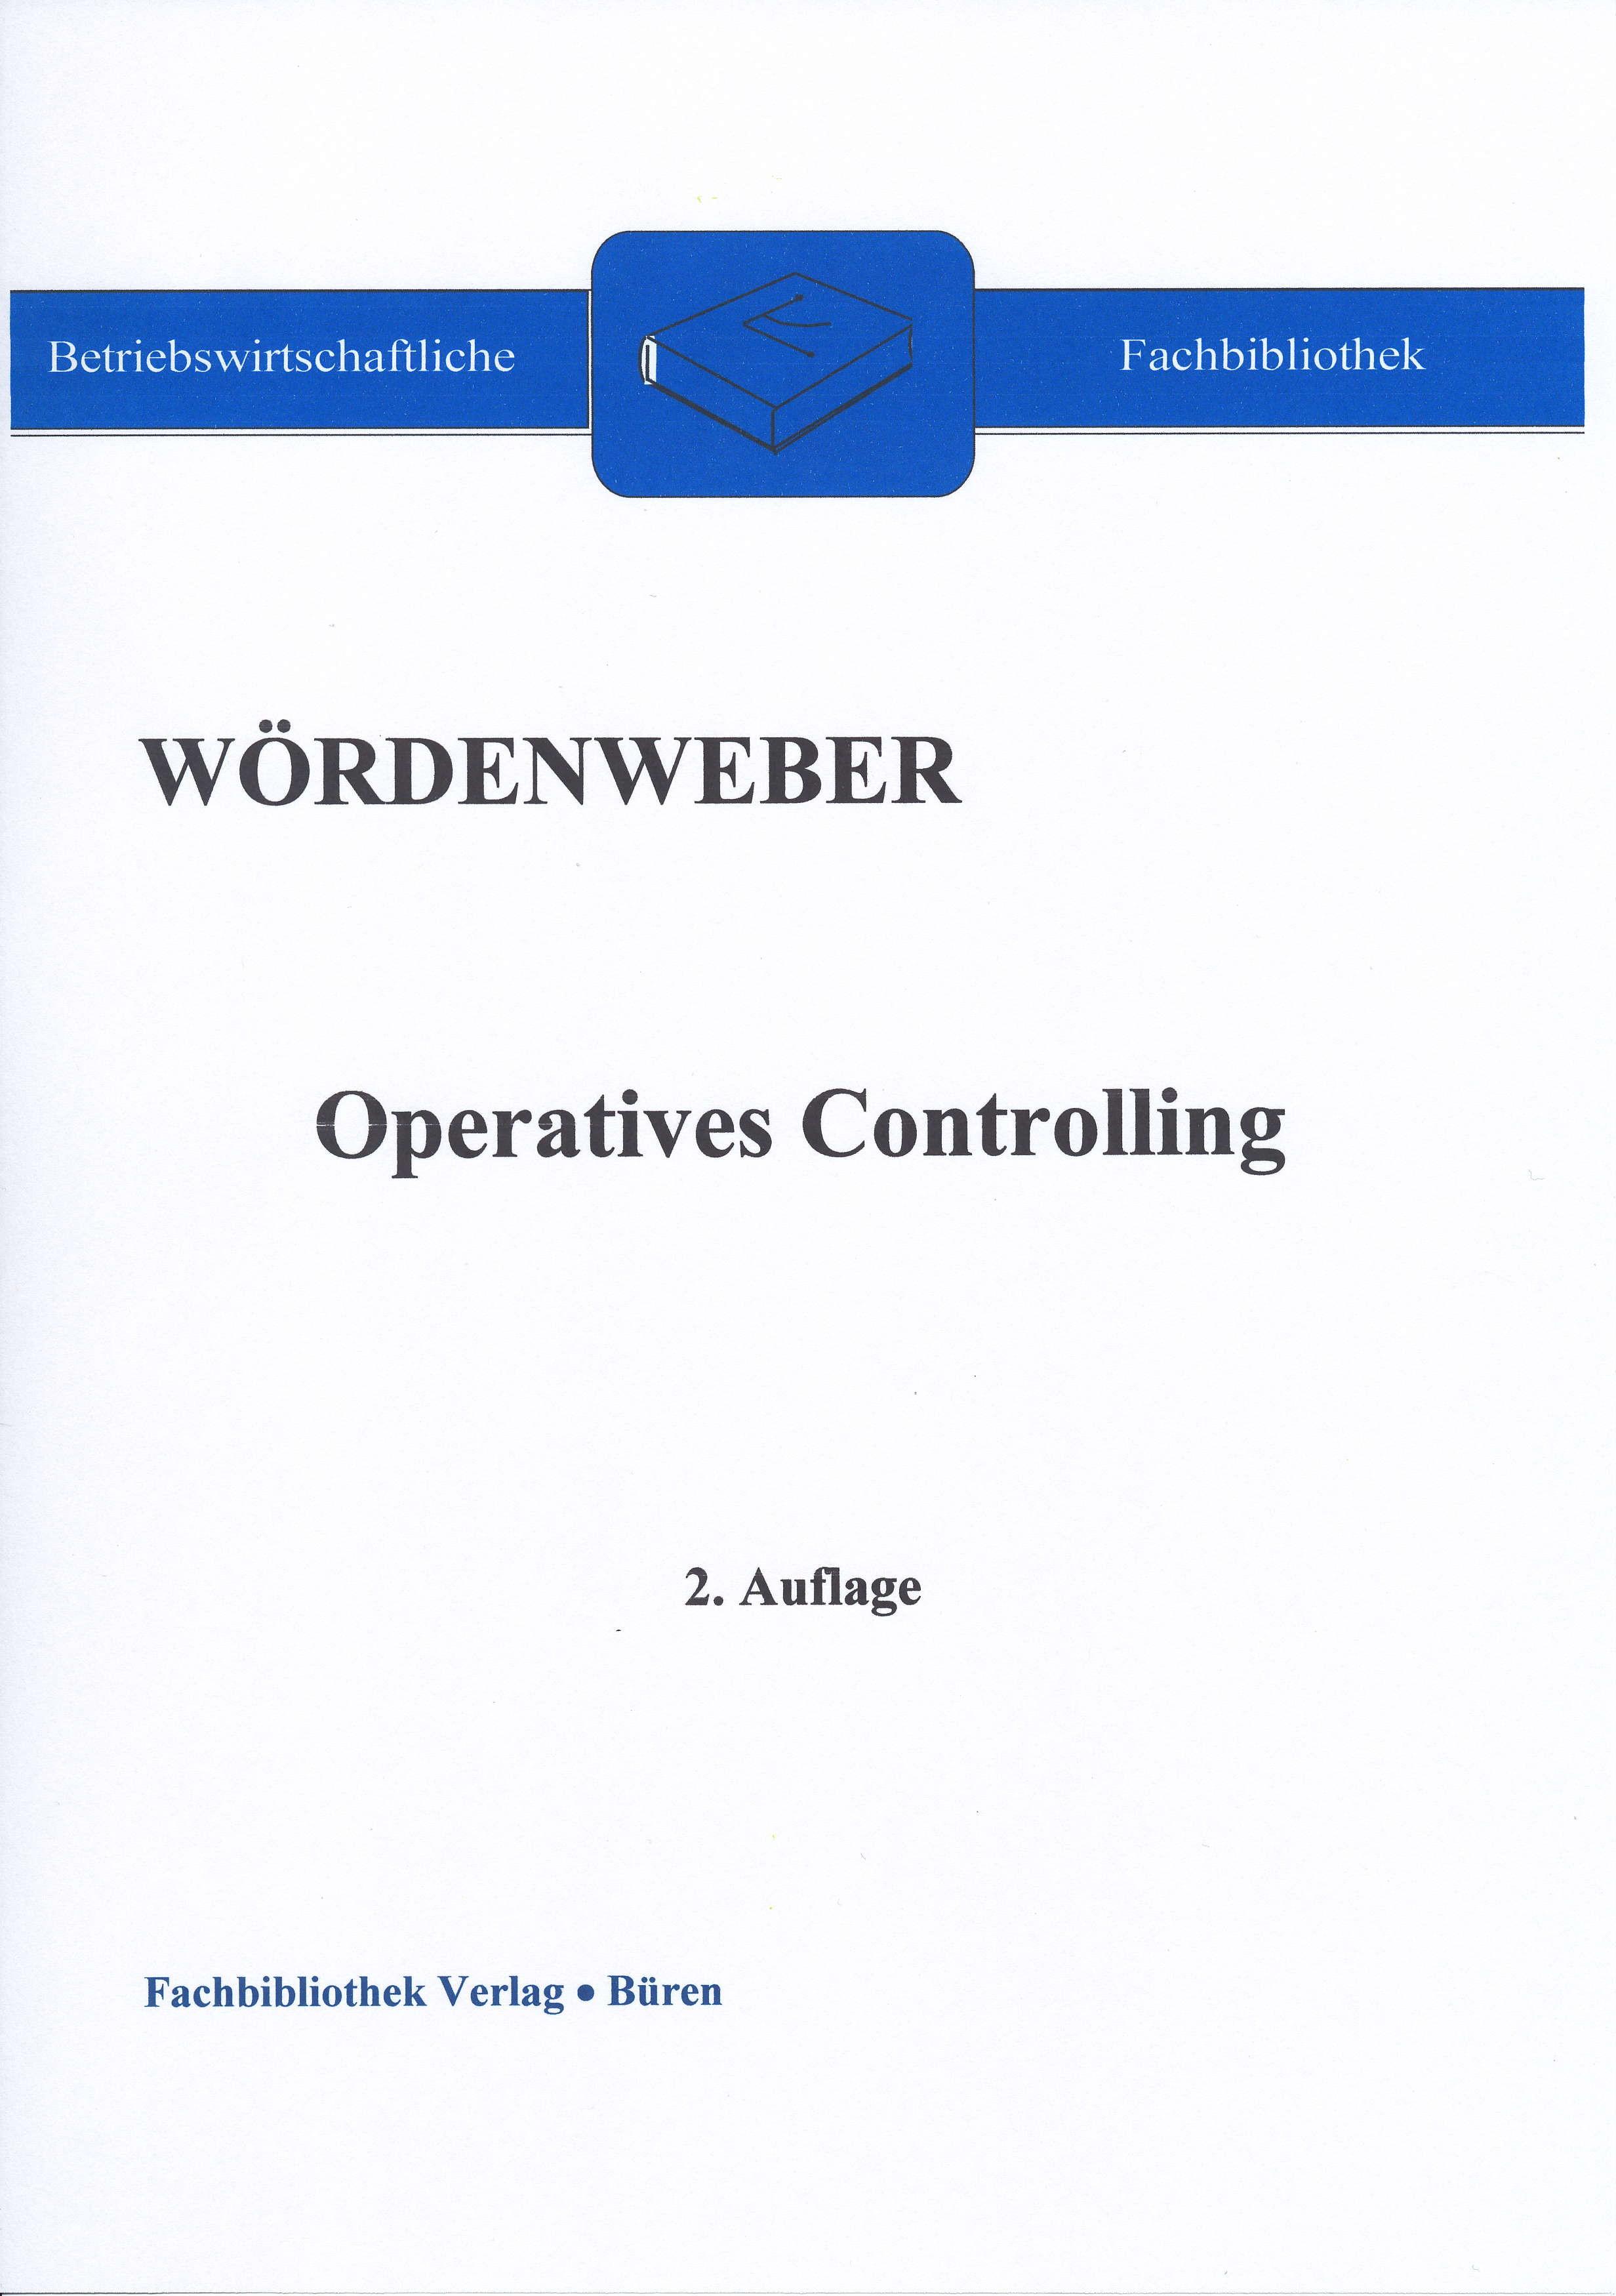 Wördenweber Operatives Controlling